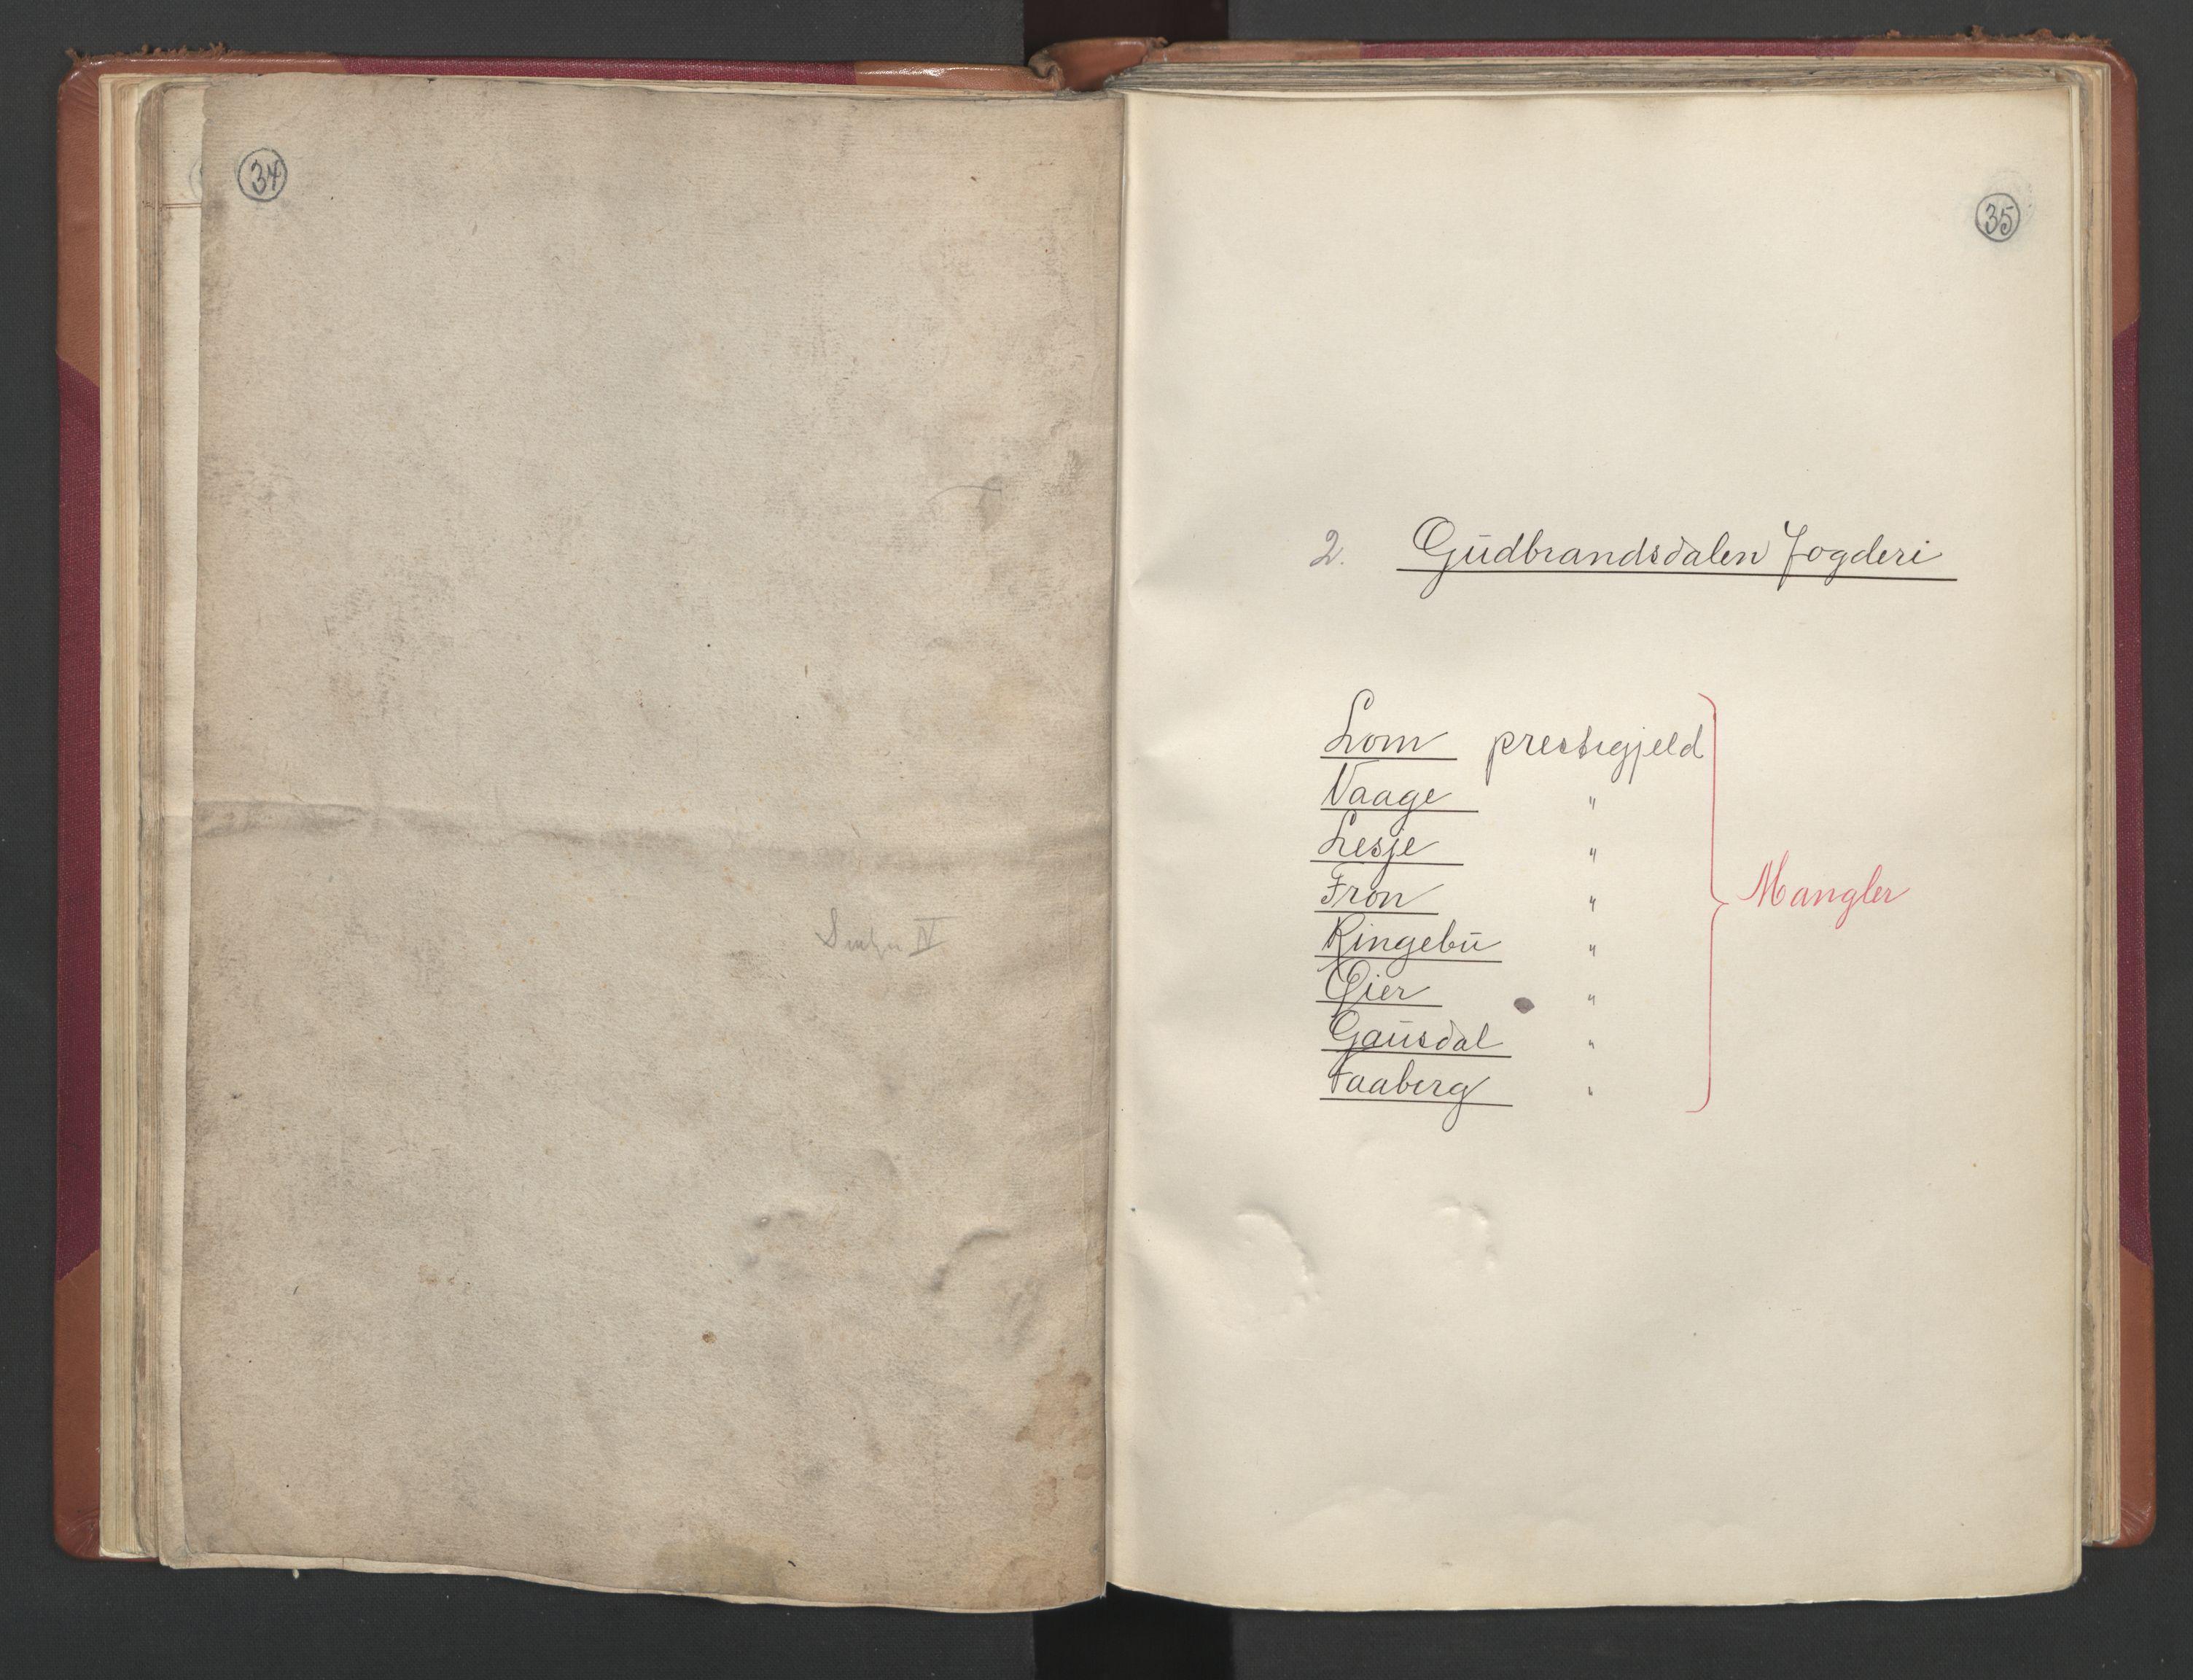 RA, Manntallet 1701, nr. 2: Solør, Odal og Østerdal fogderi og Larvik grevskap, 1701, s. 34-35